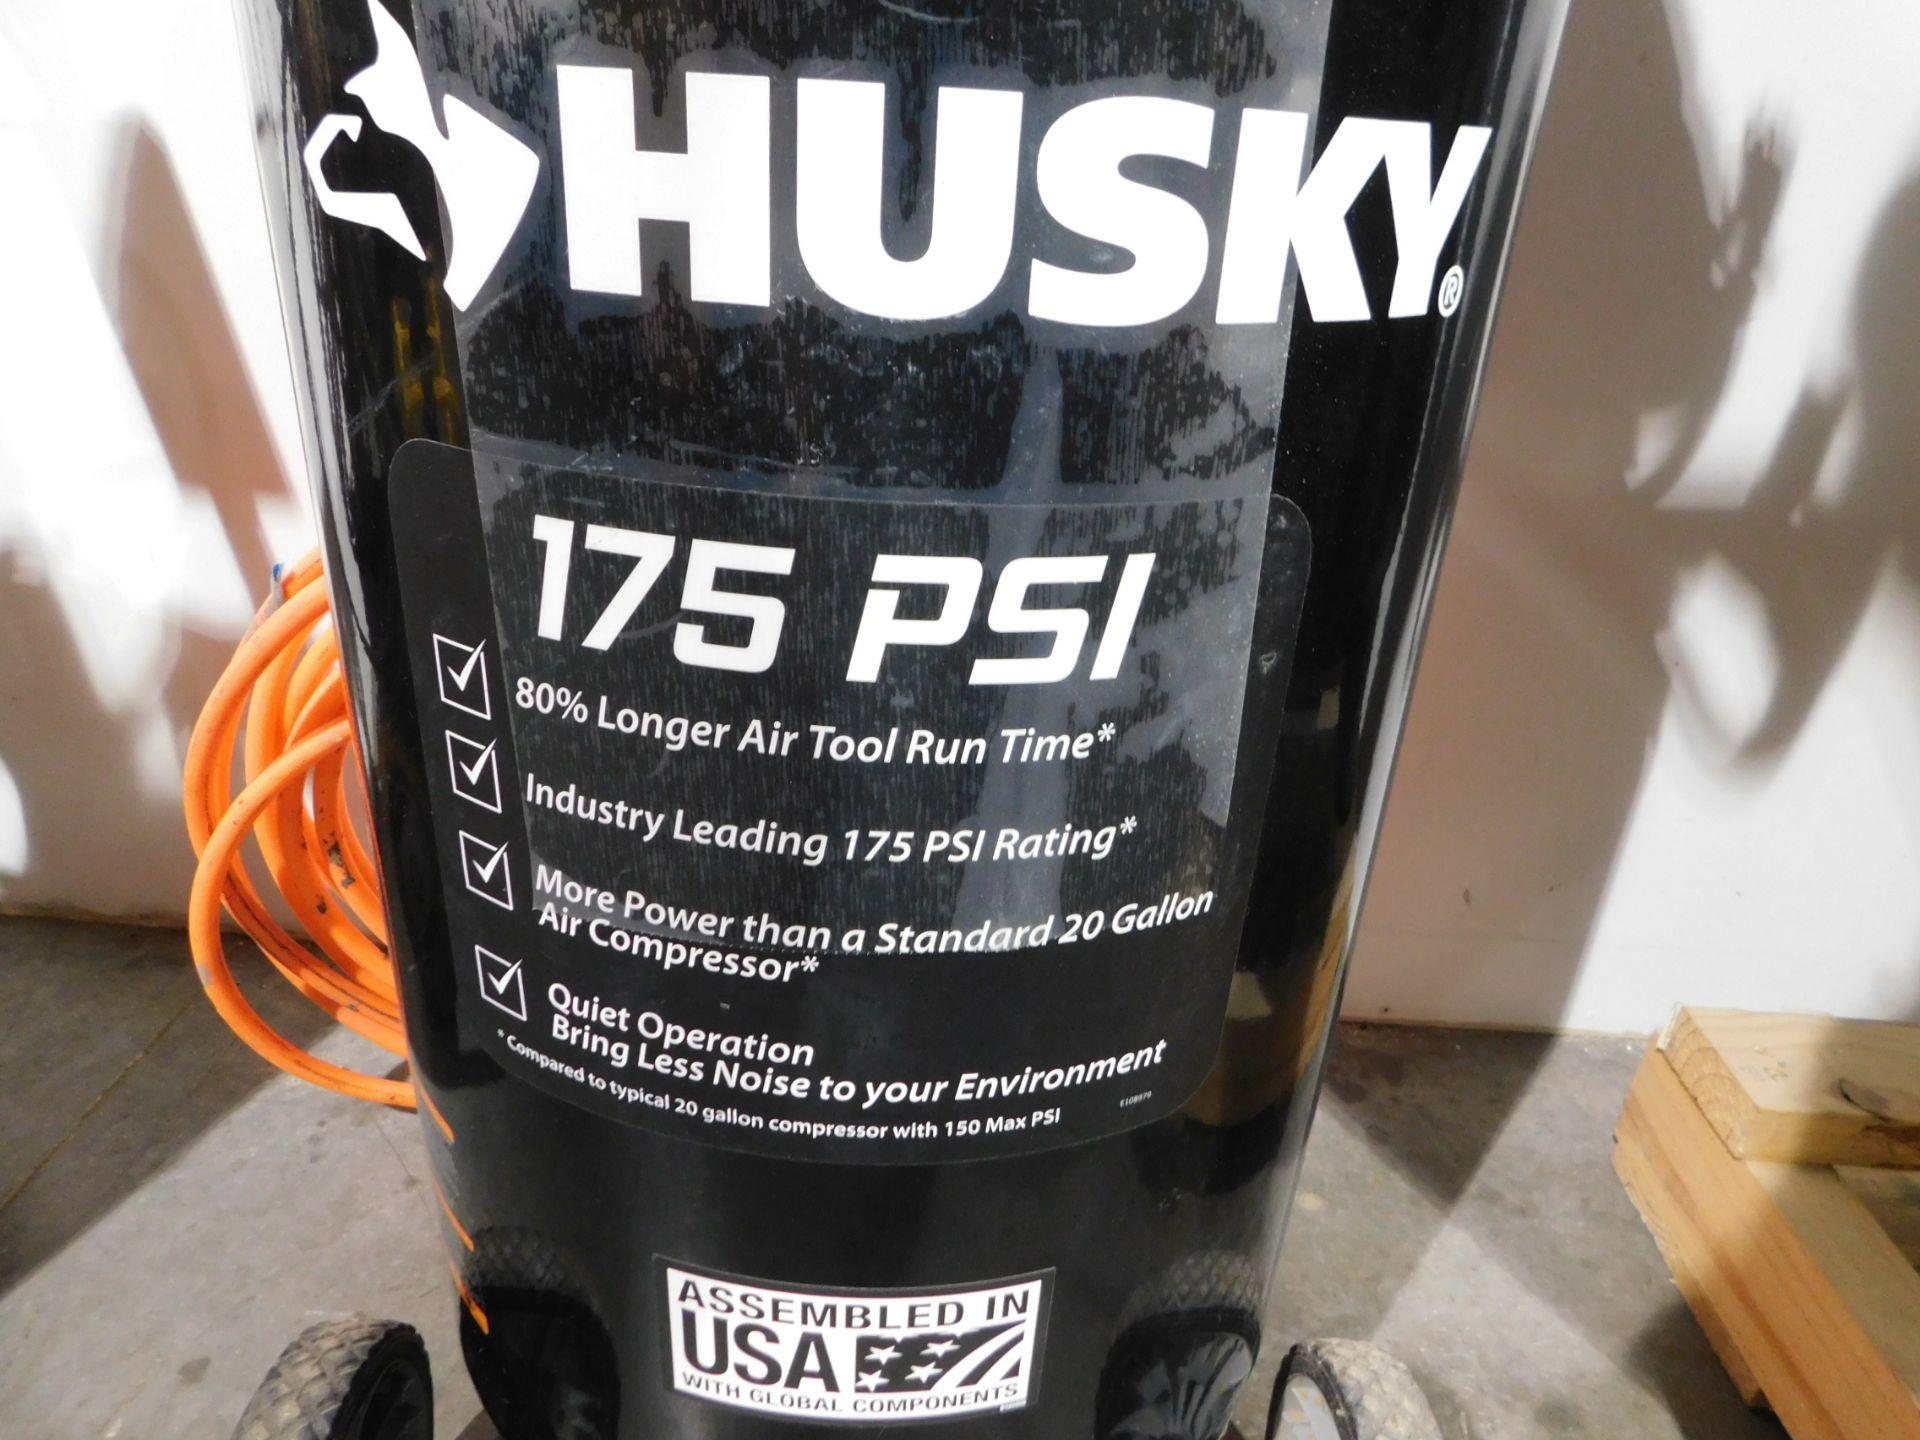 Lot 52 - Husky Portable Air Compressor, 20 Gallon Tank, 4SCFM@ 90 PSI, 1.3 HP, 115 V, 1 Phase